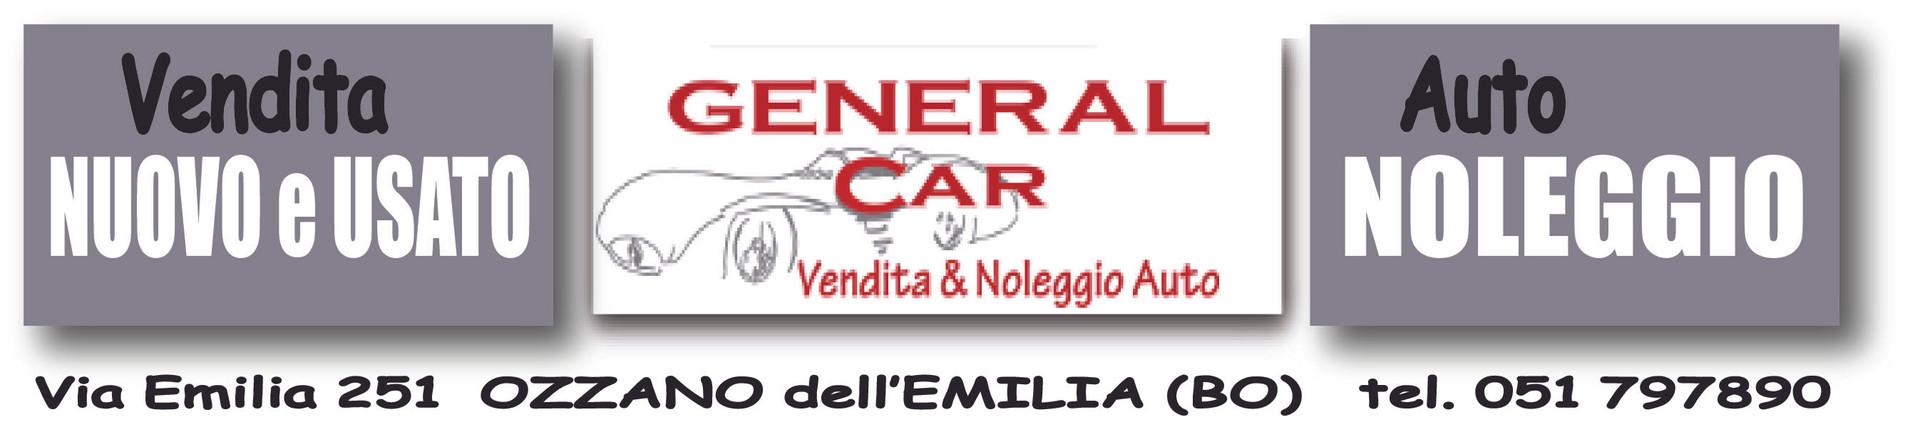 general car.jpg